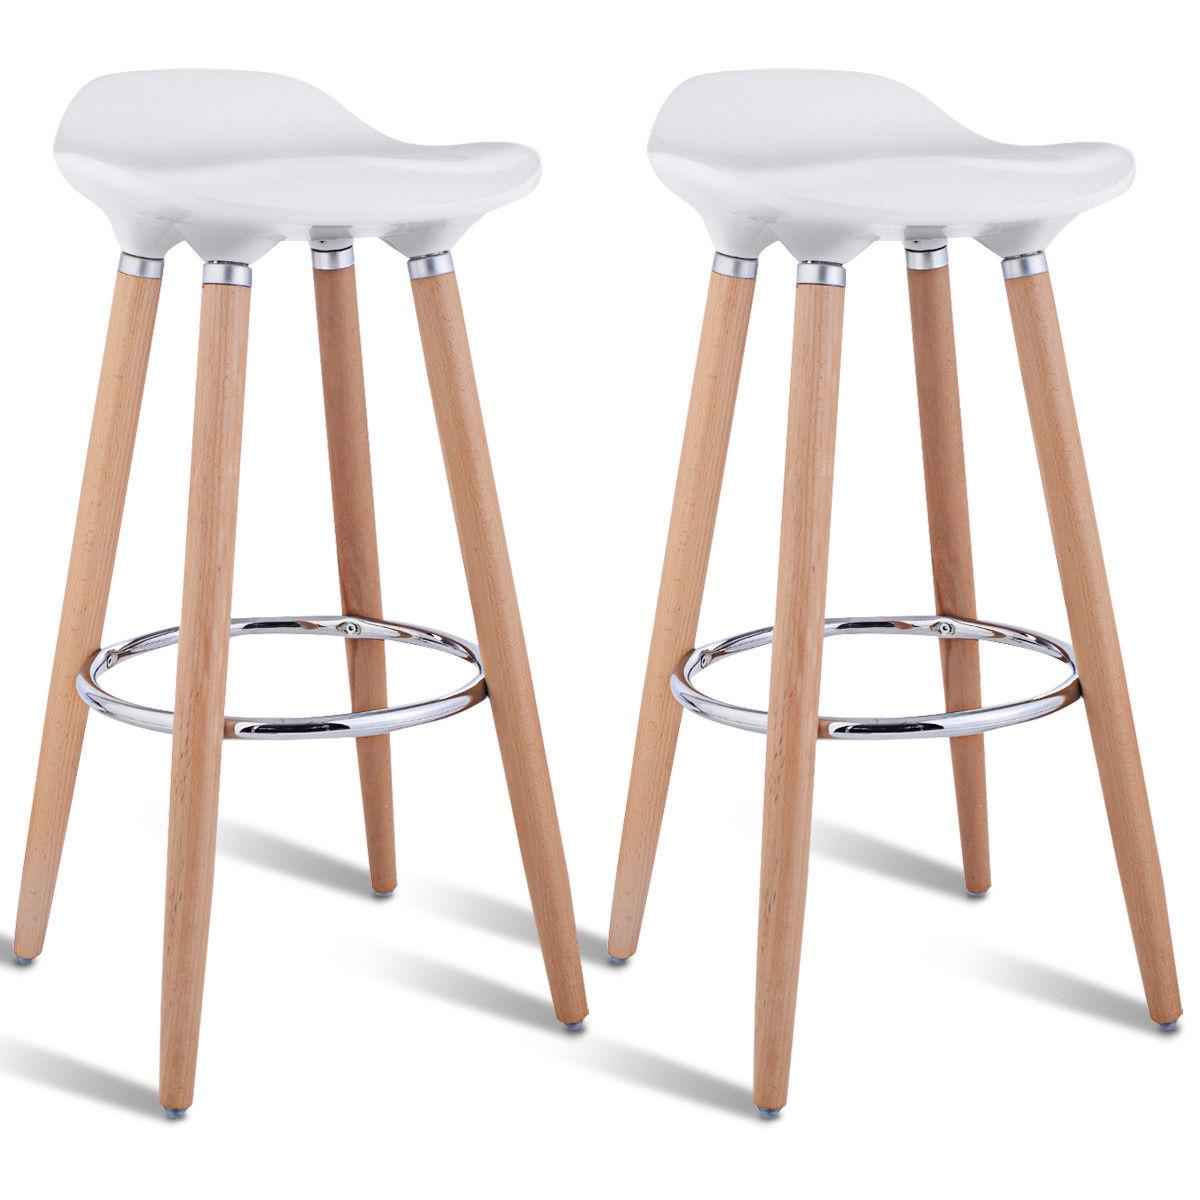 Costway Set Of 2 ABS Bar Stool Breakfast Barstool W/ Wooden Legs Kitchen Furniture White